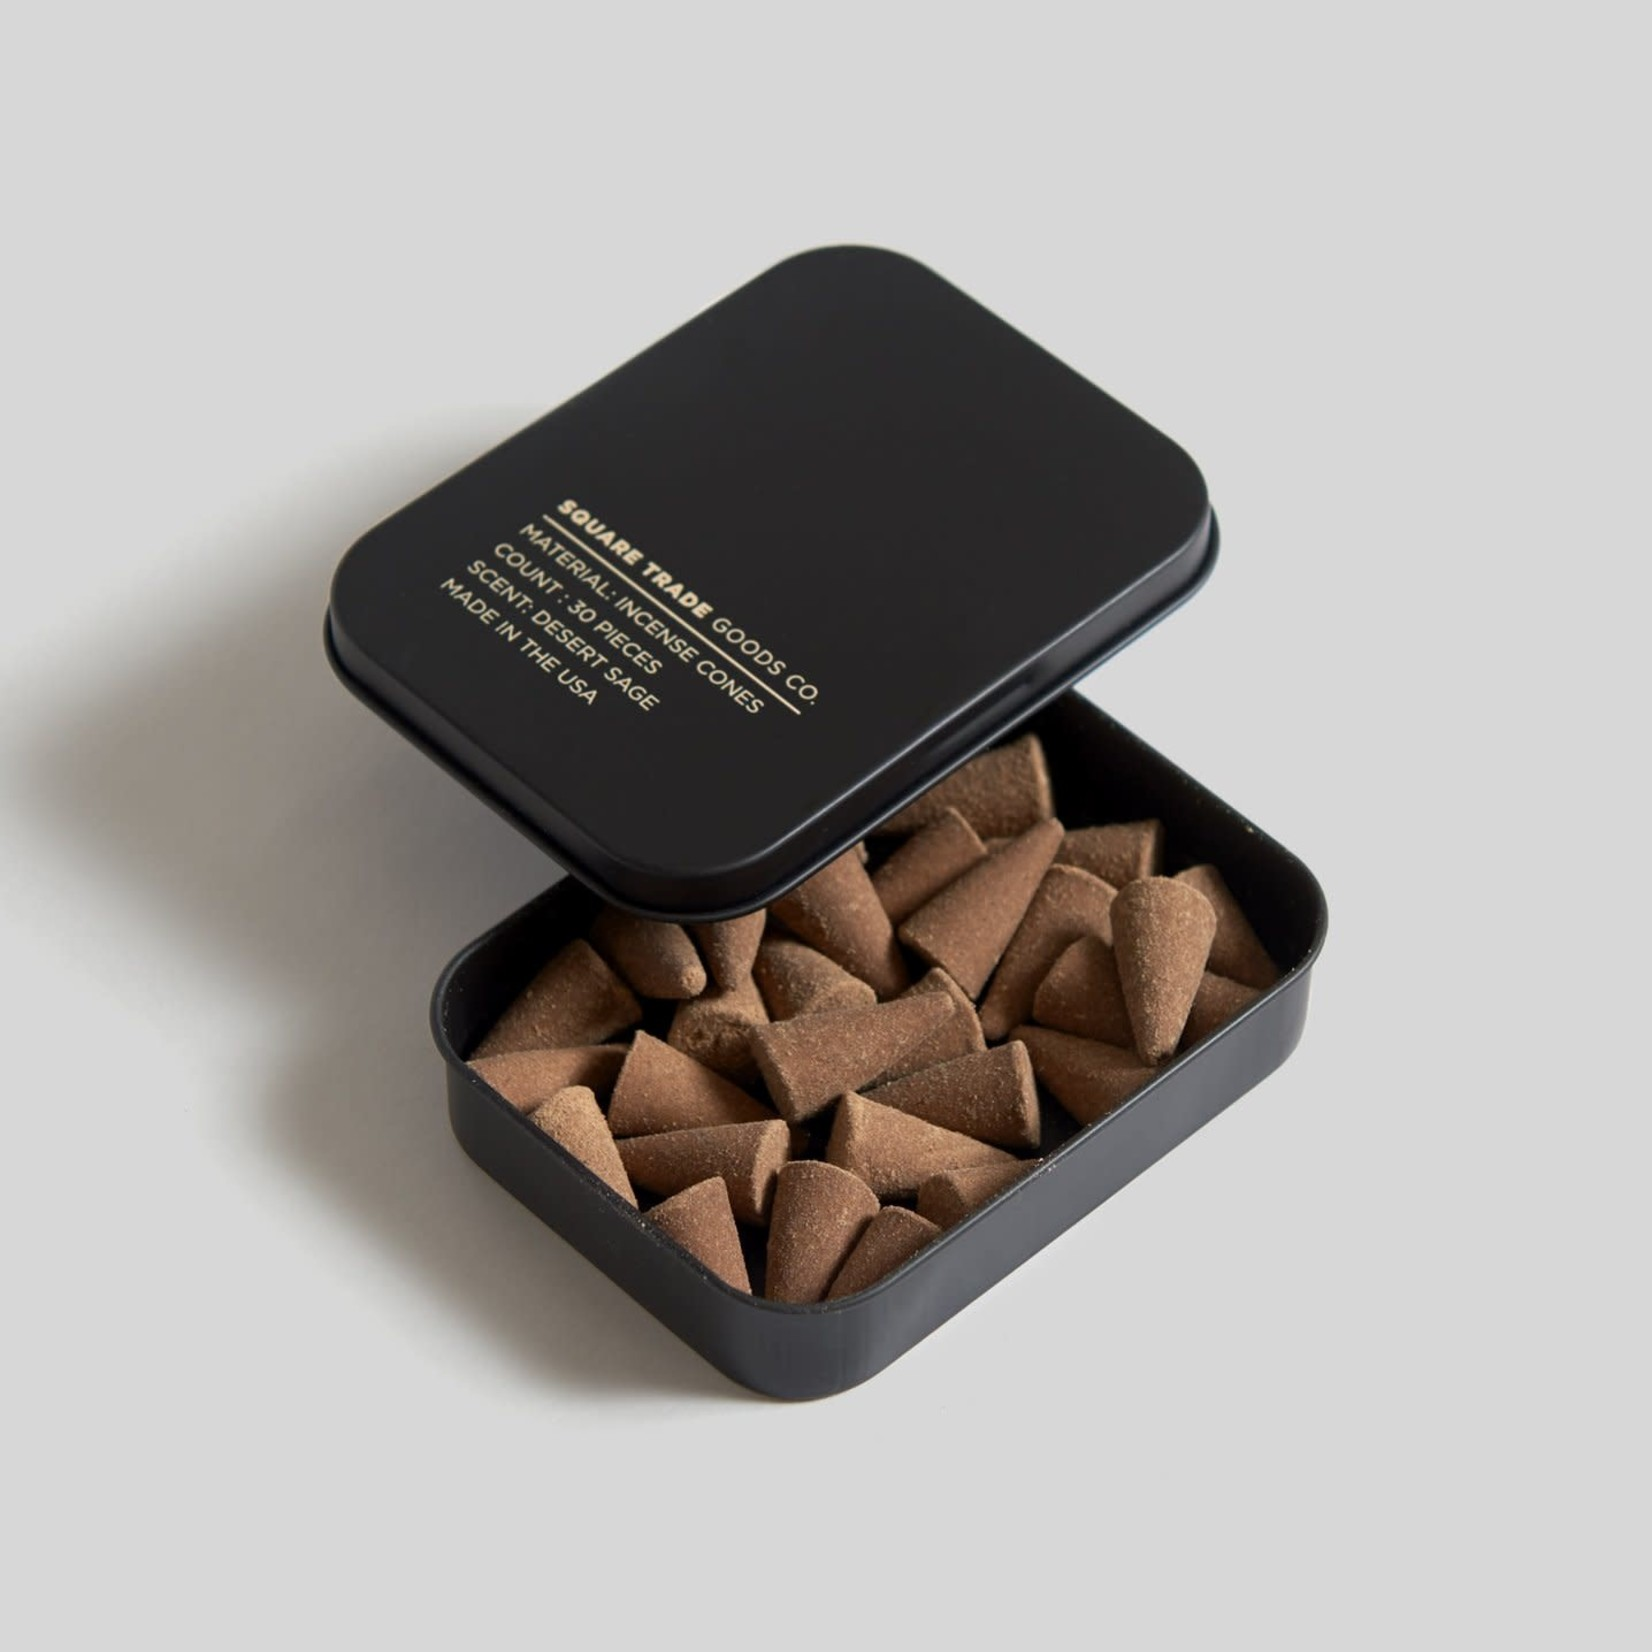 Square Trade Goods Incense Cones by Square Trade Goods